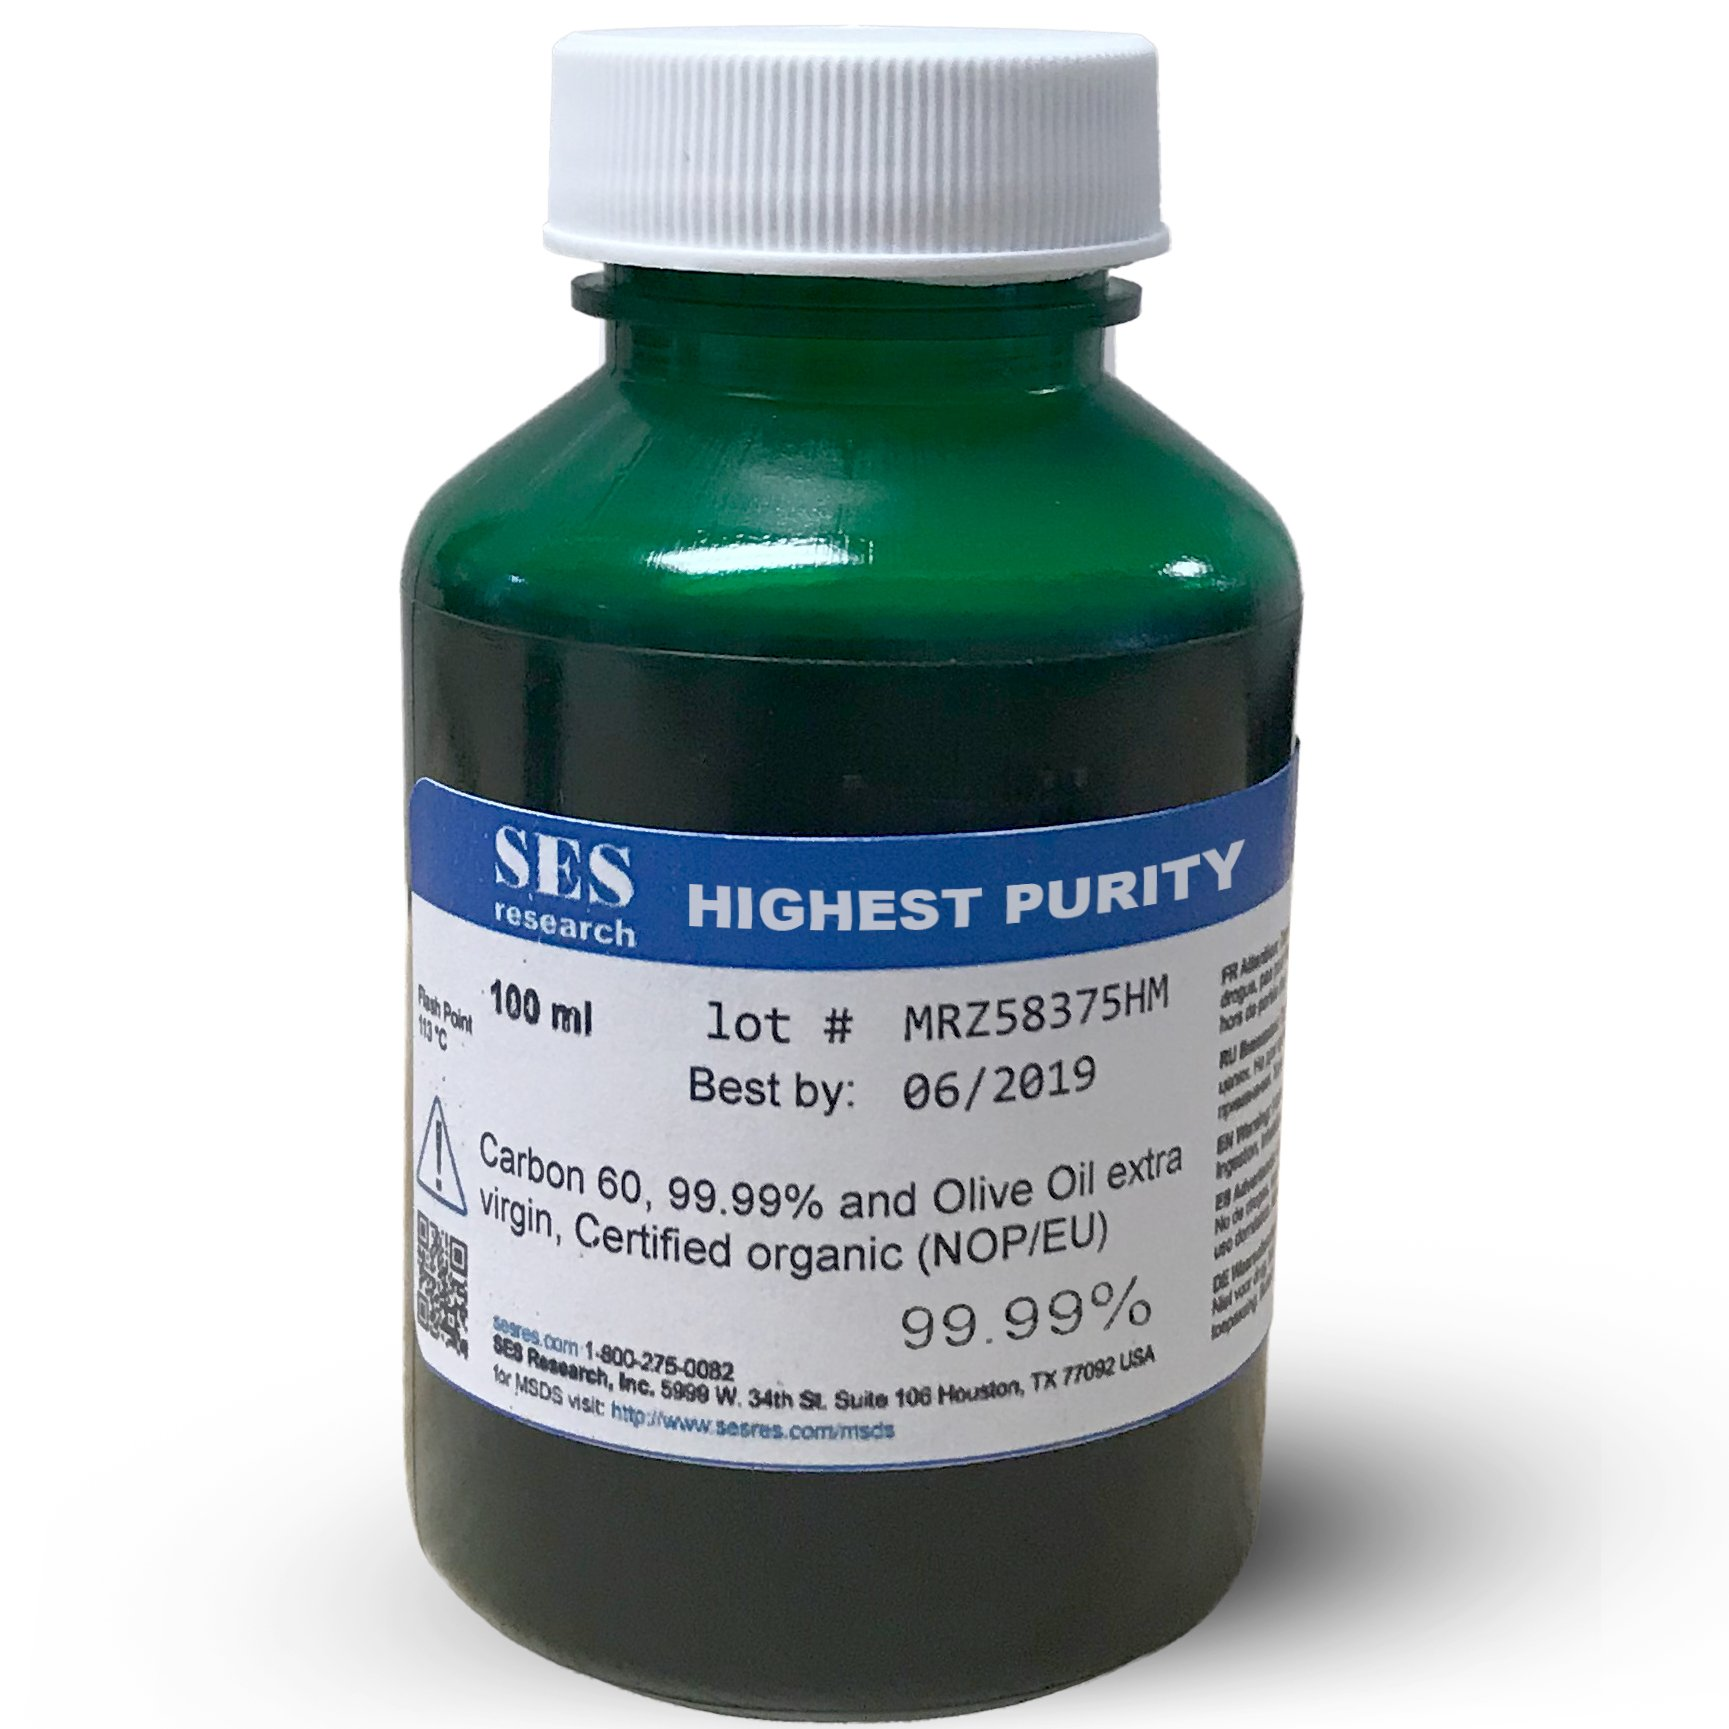 C60 Olive Oil - Organic - Highest Purity 99.99% - 100 ml